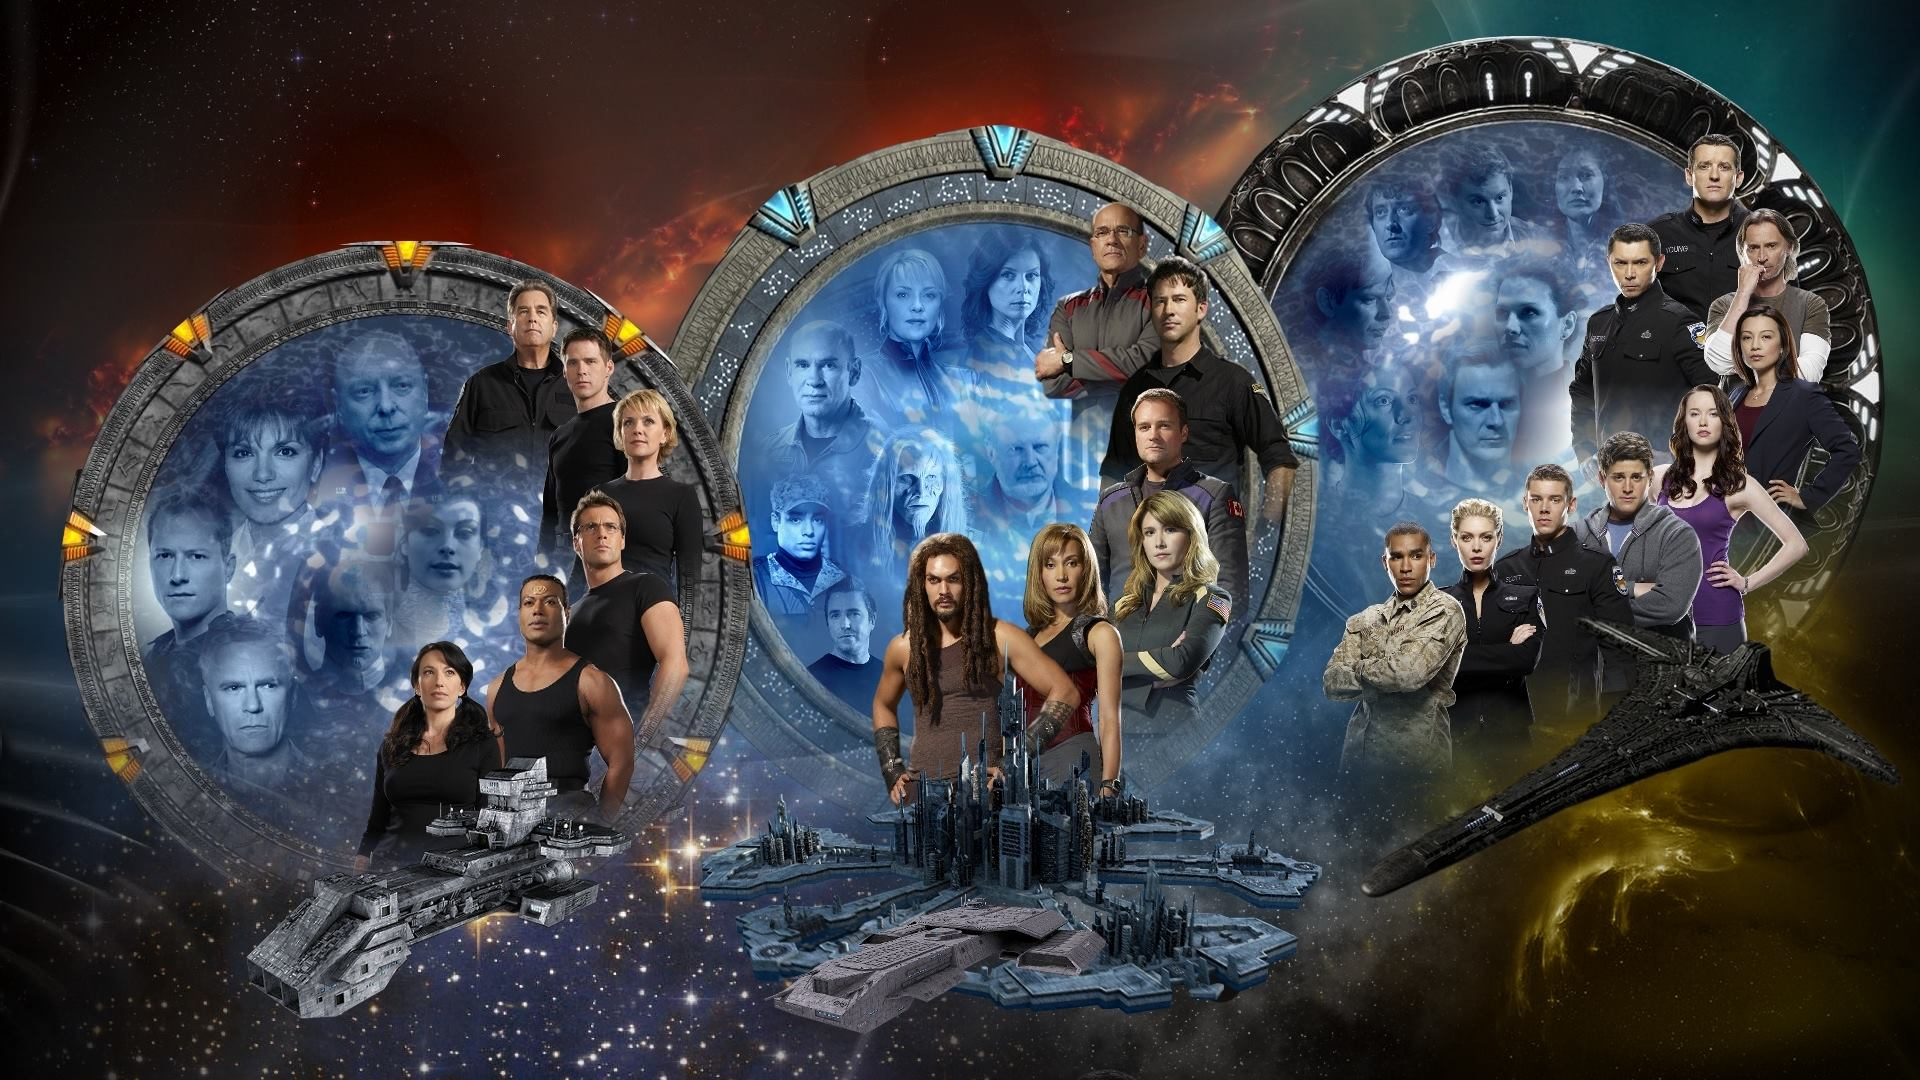 Cute Cartoon Fall Wallpaper Stargate Wallpapers Hd Pixelstalk Net